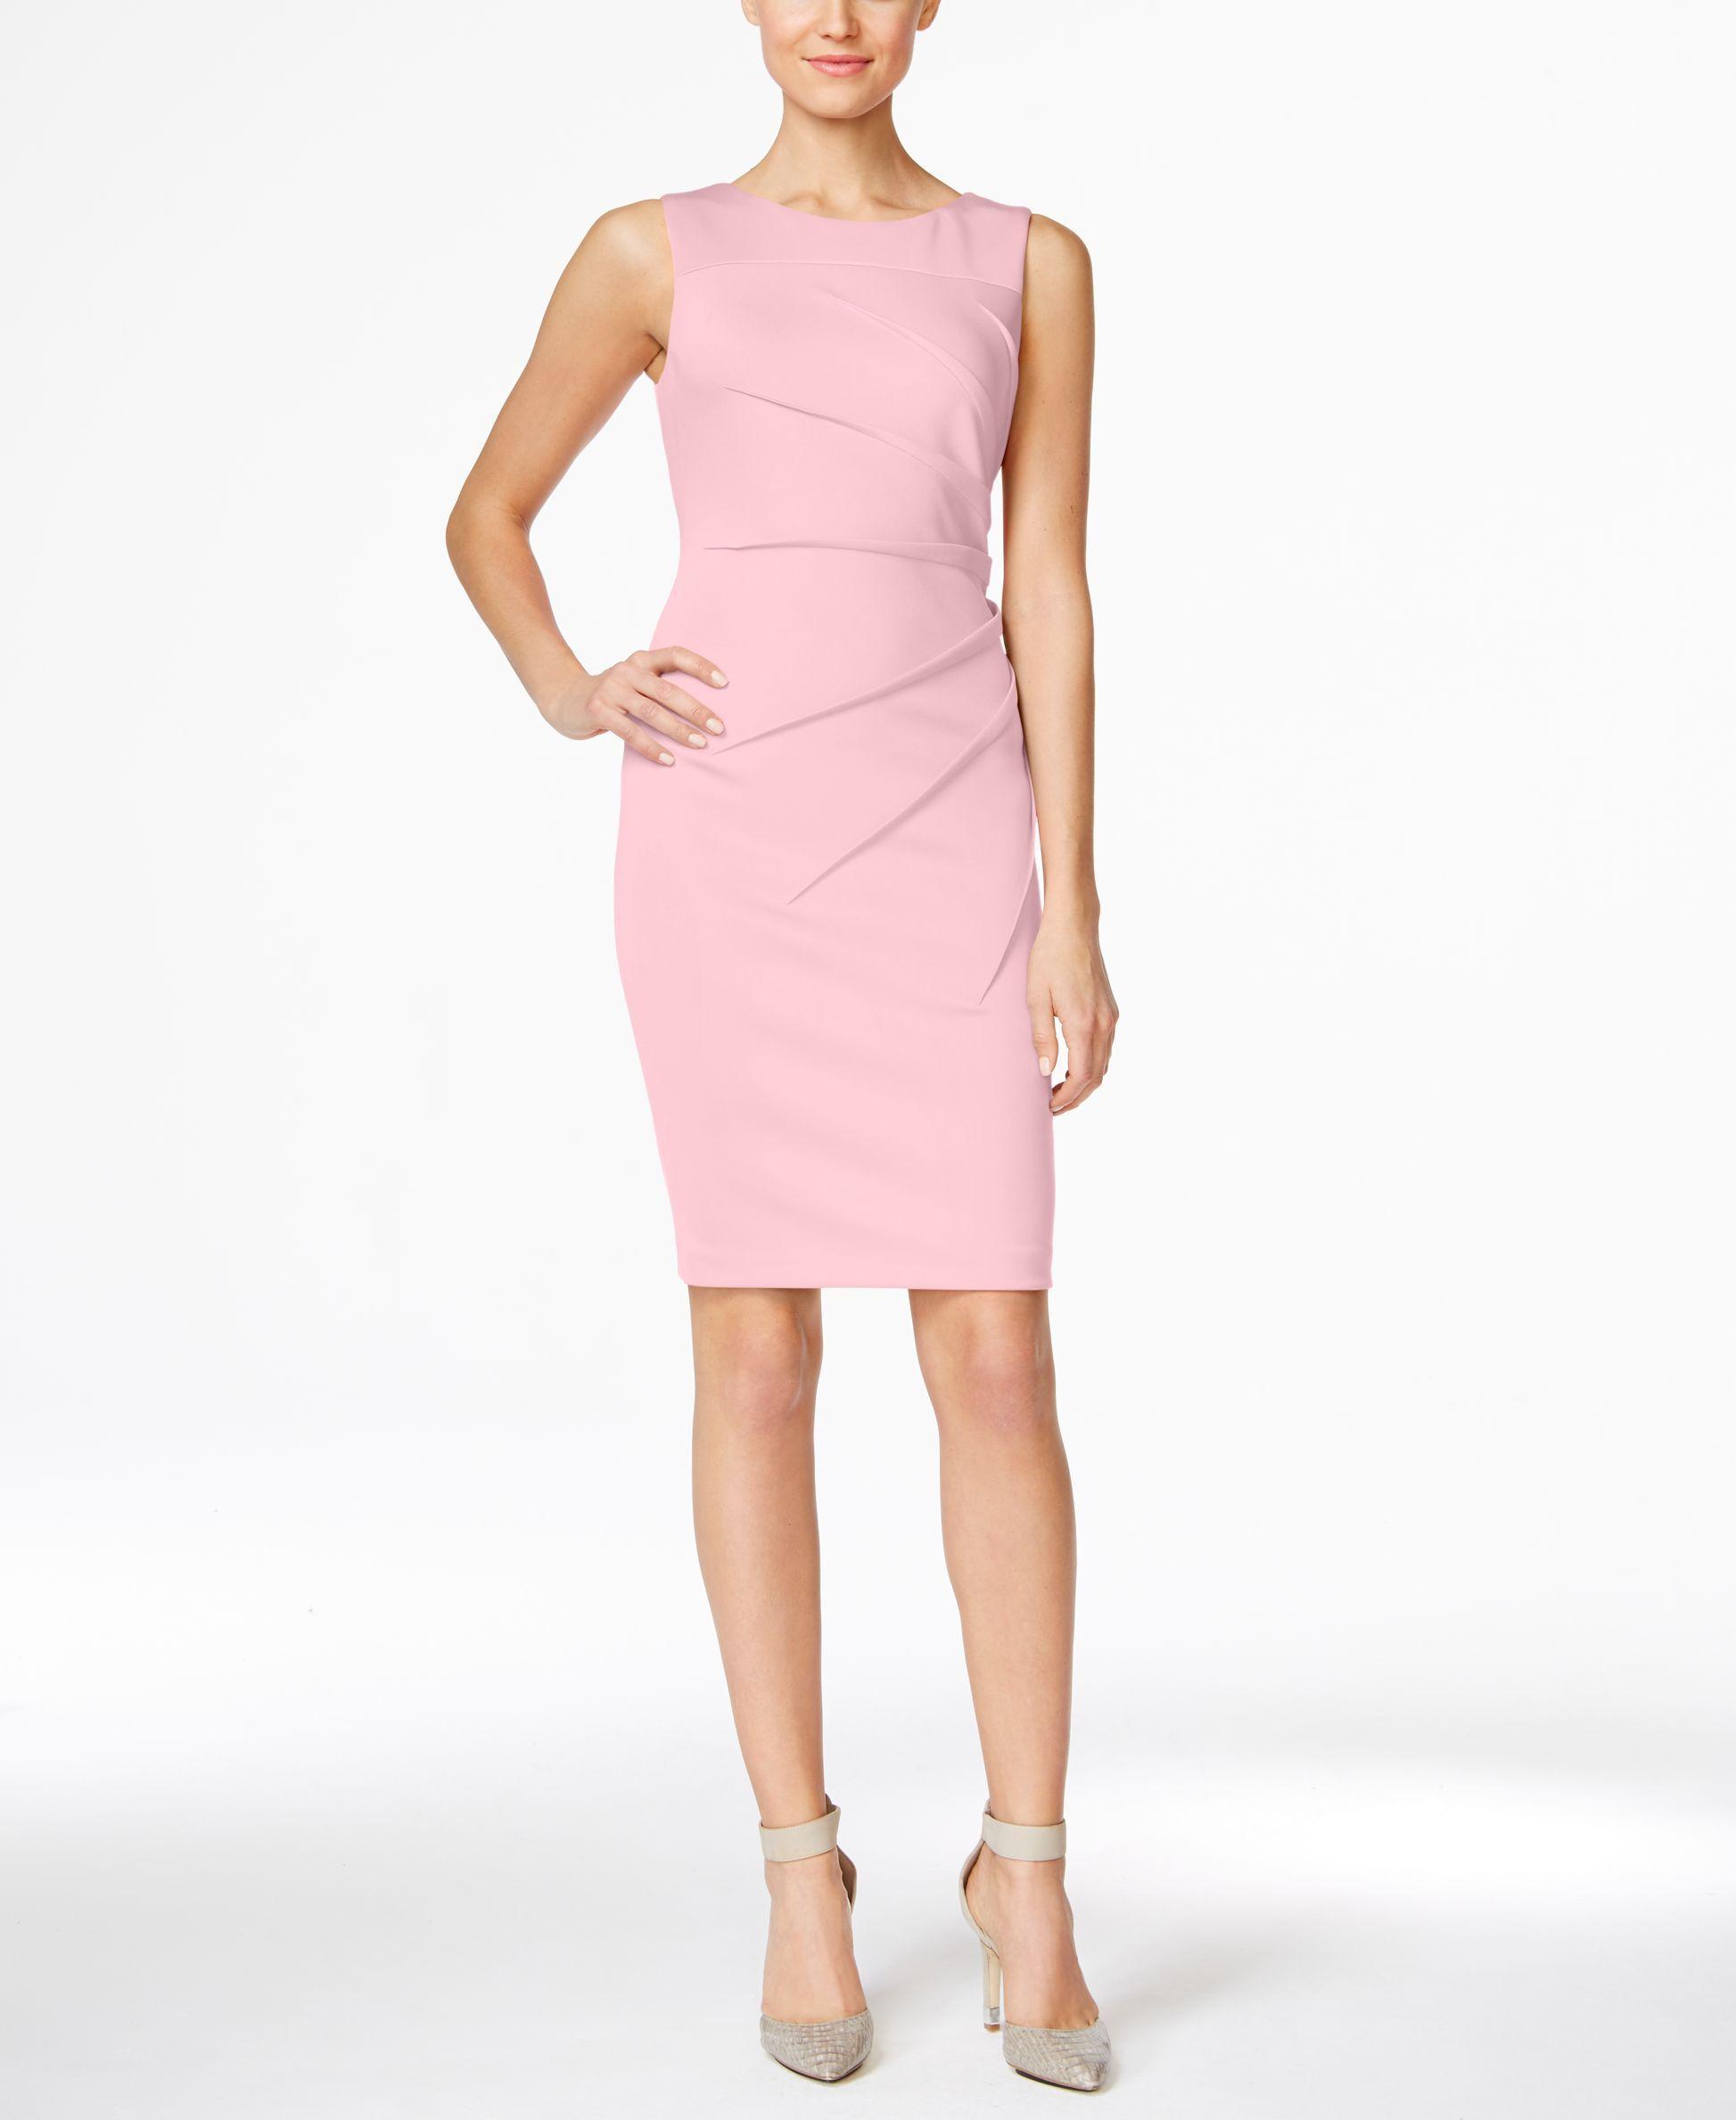 Calvin Klein Starburst Sheath Dress Sleeveless Sheath Dress Dresses For Work Work Dresses For Women